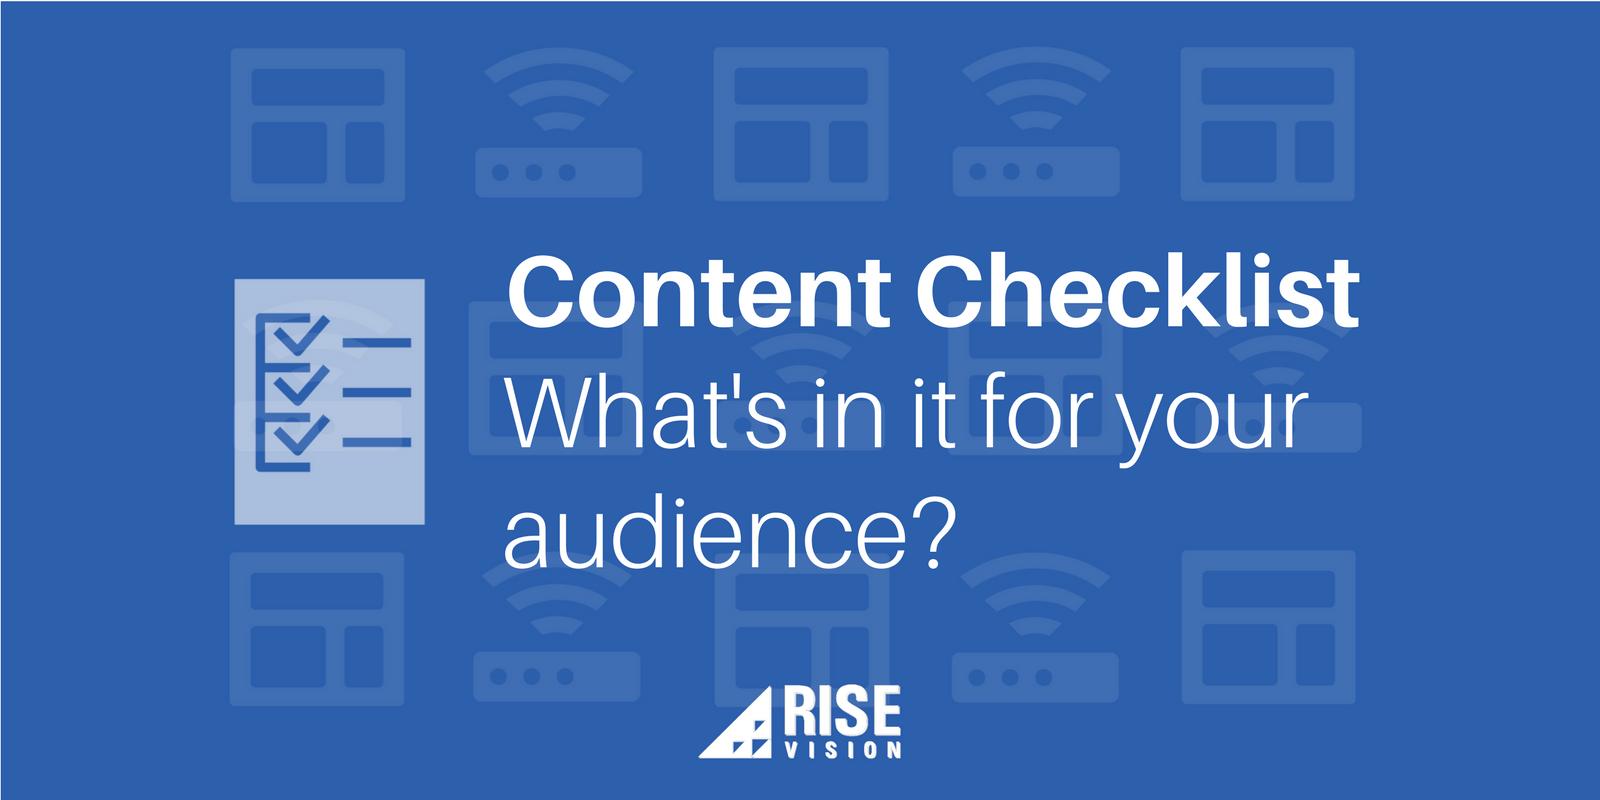 Rise Vision Digital Signage Content Checklist.png